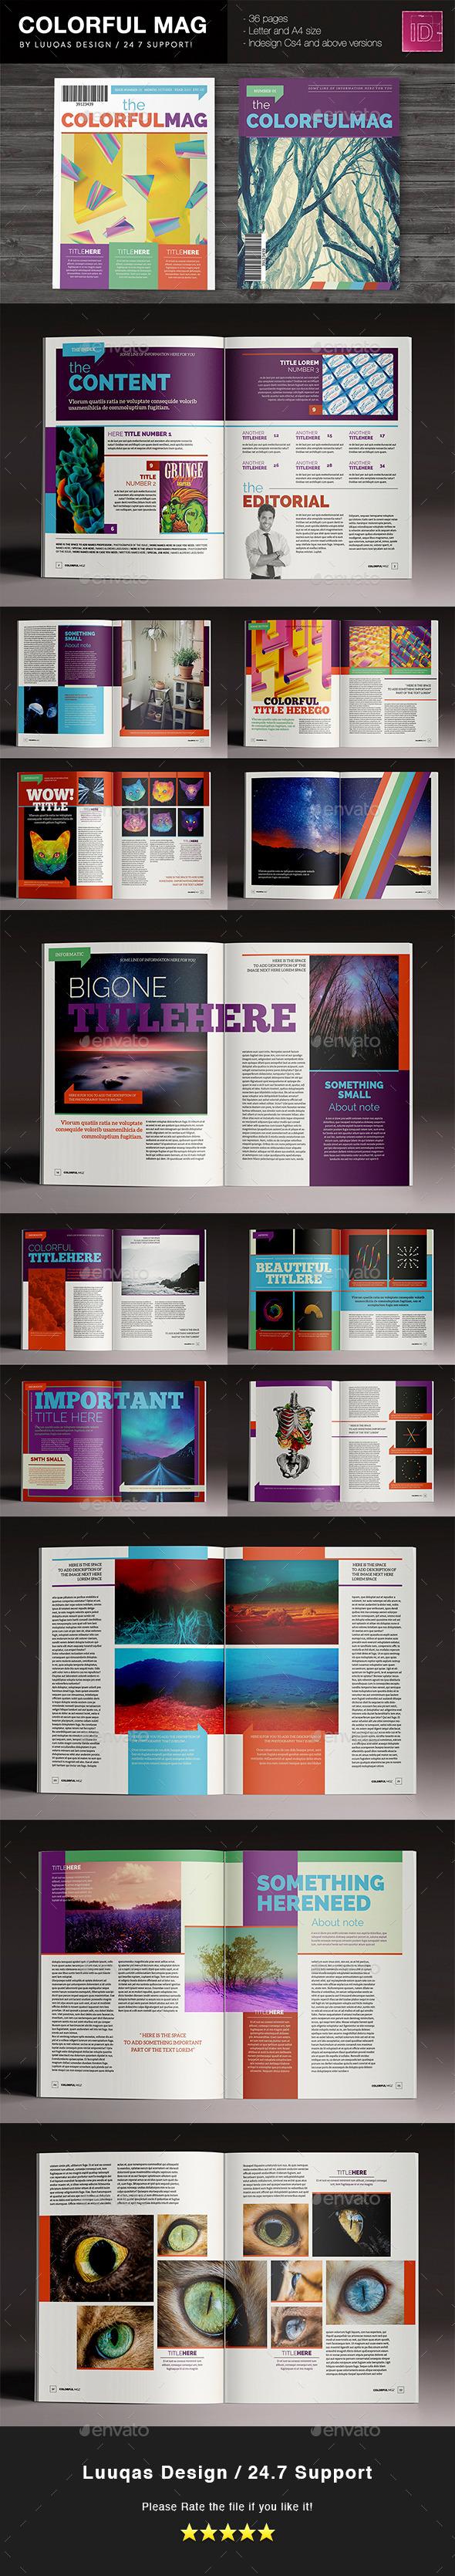 The Colorful Magazine - Magazines Print Templates